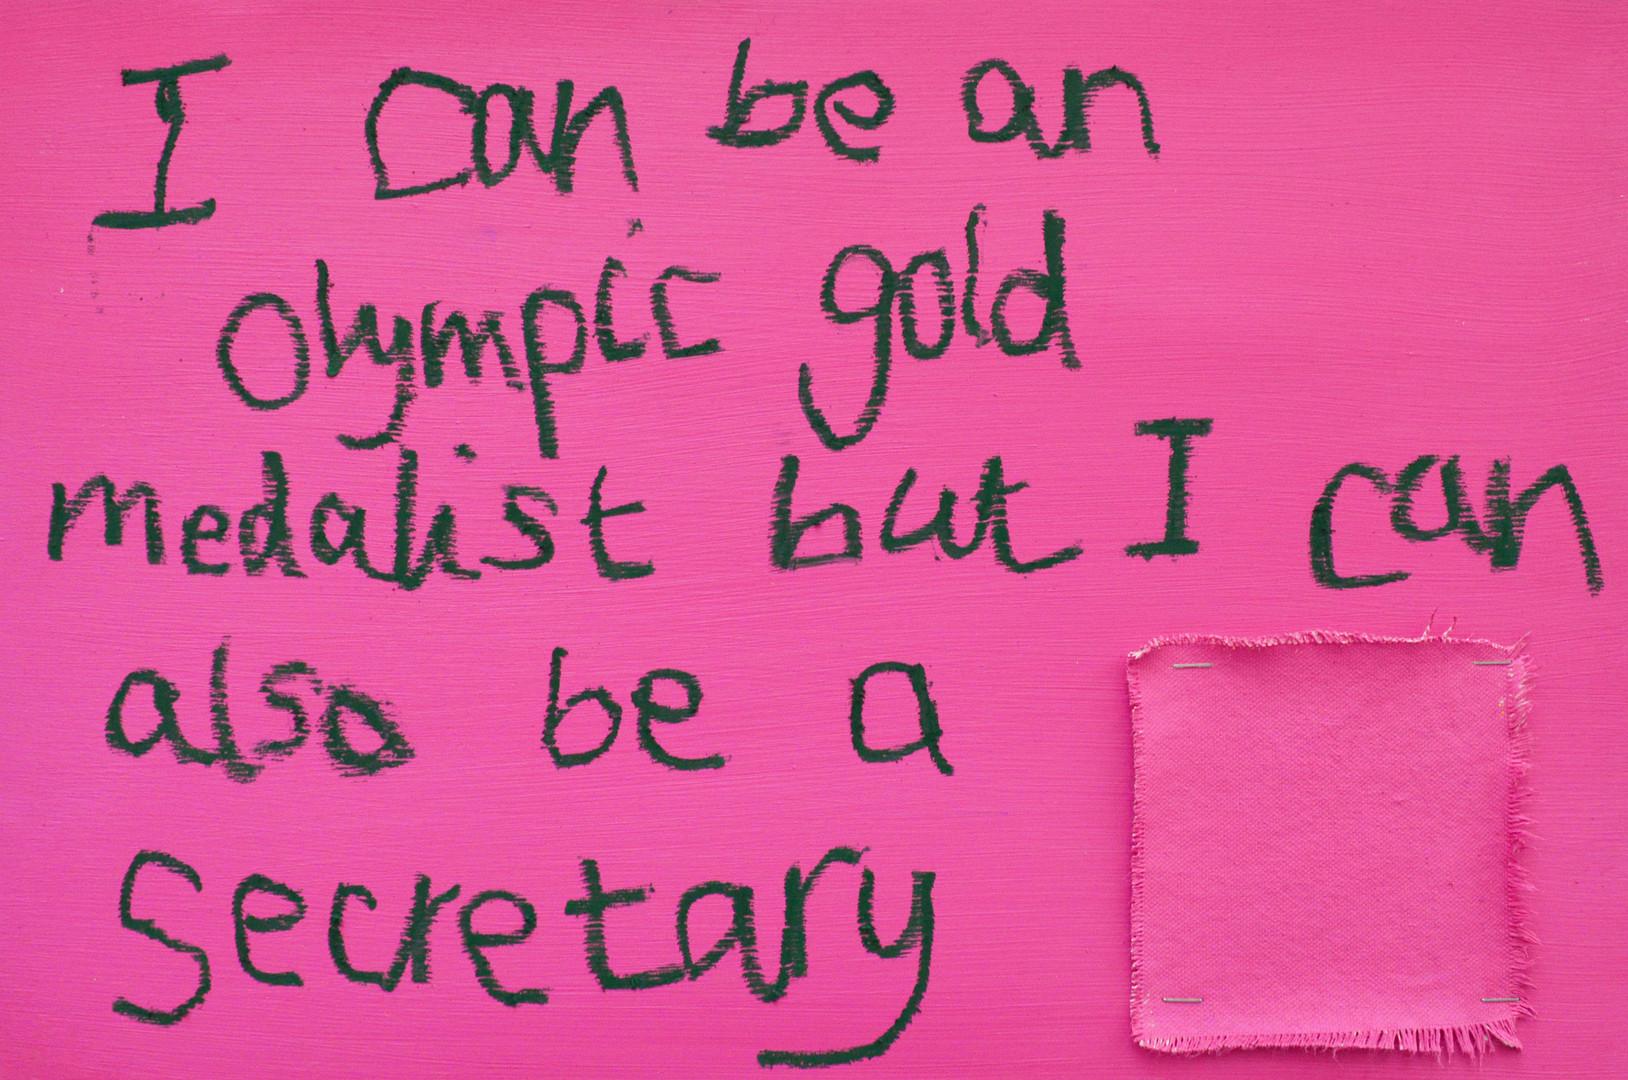 Olympic Vs. Secretary